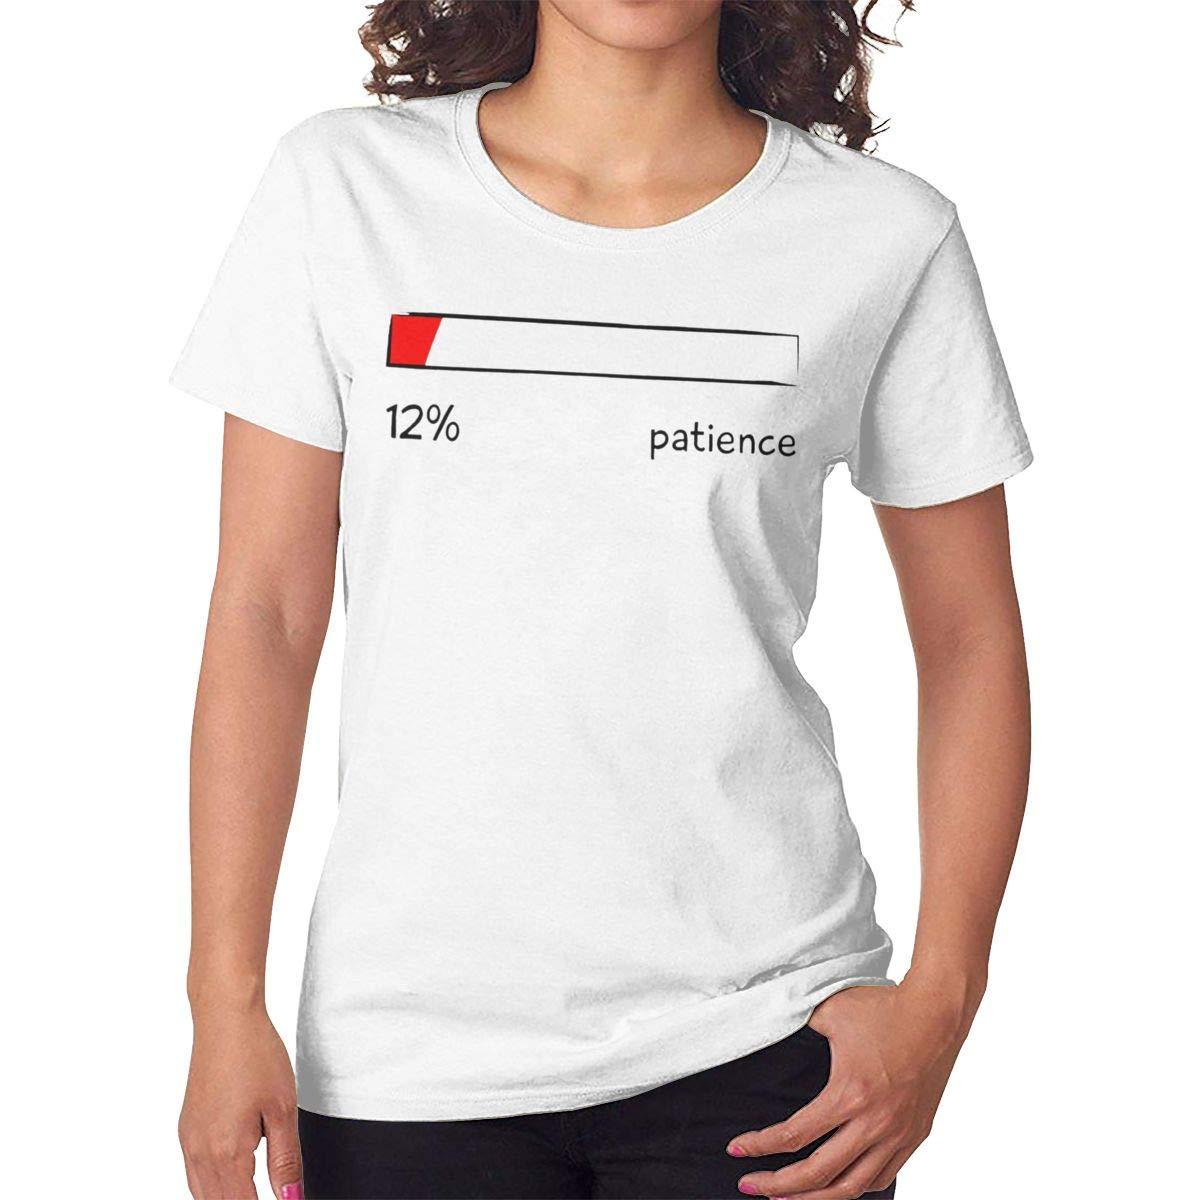 Maohongko Patience Percentage Level Short Sleeve Round Neck T Shirt